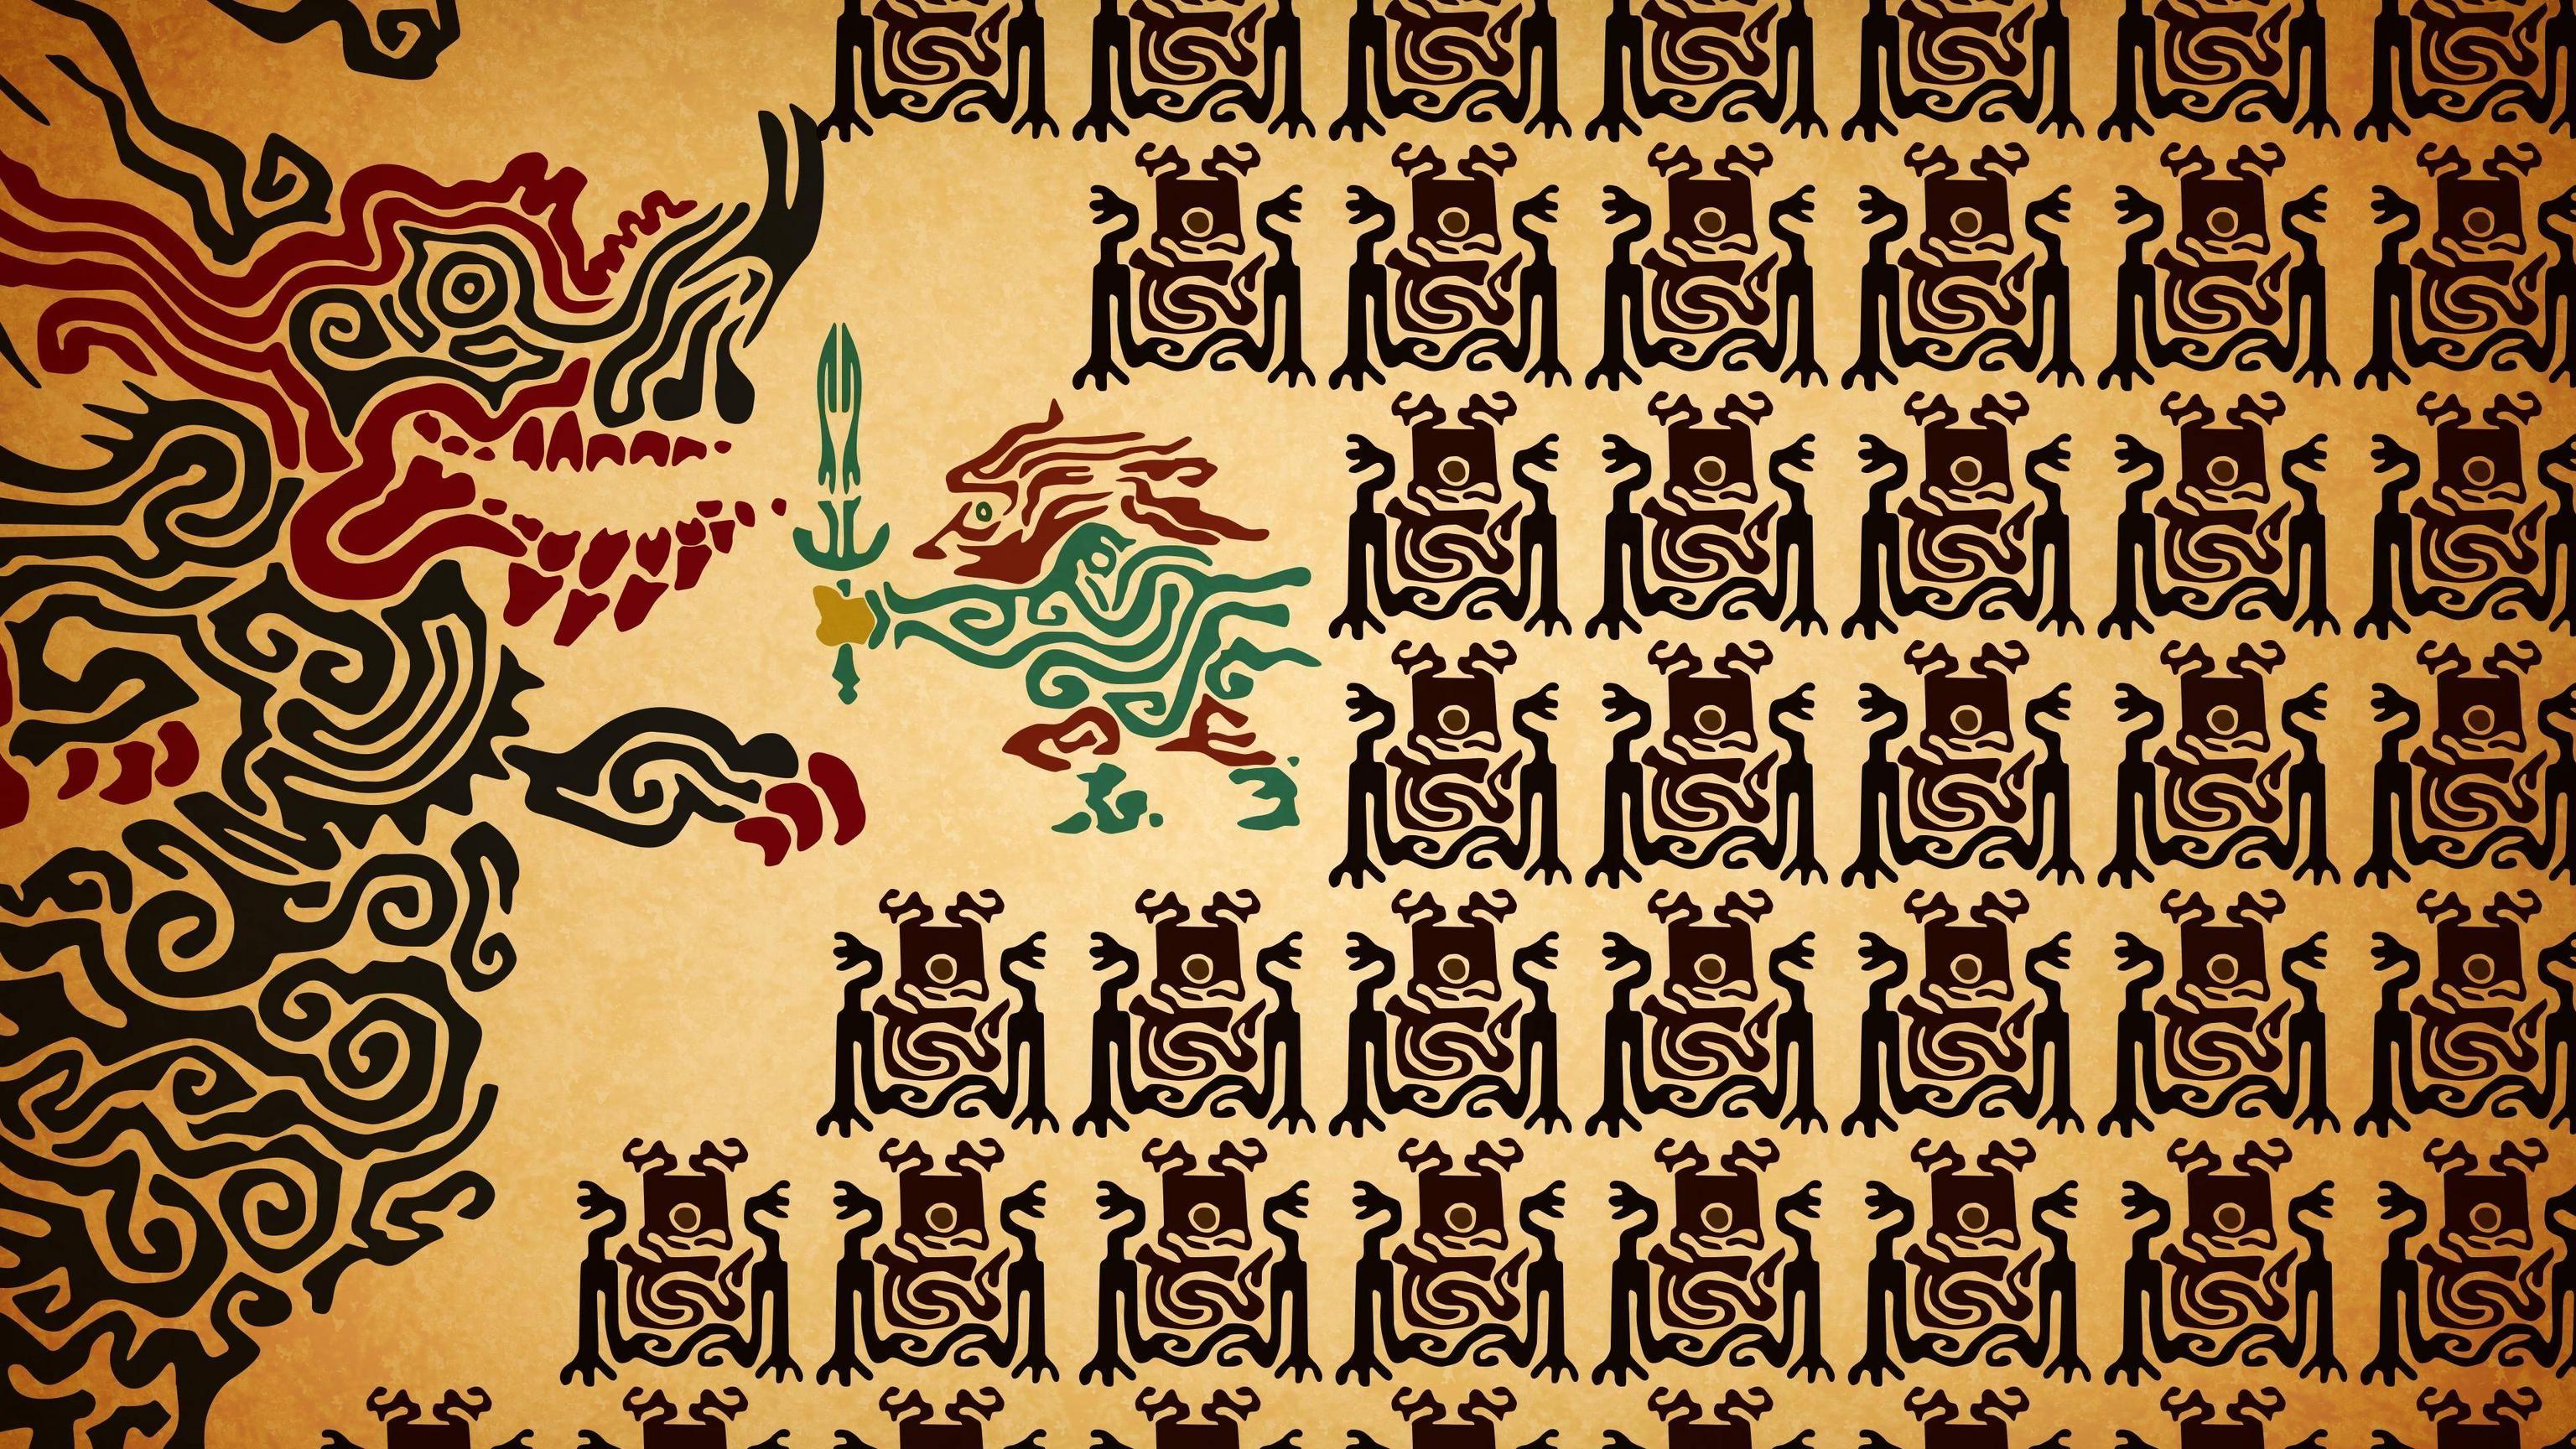 Ganondorf Wallpaper 74 Images